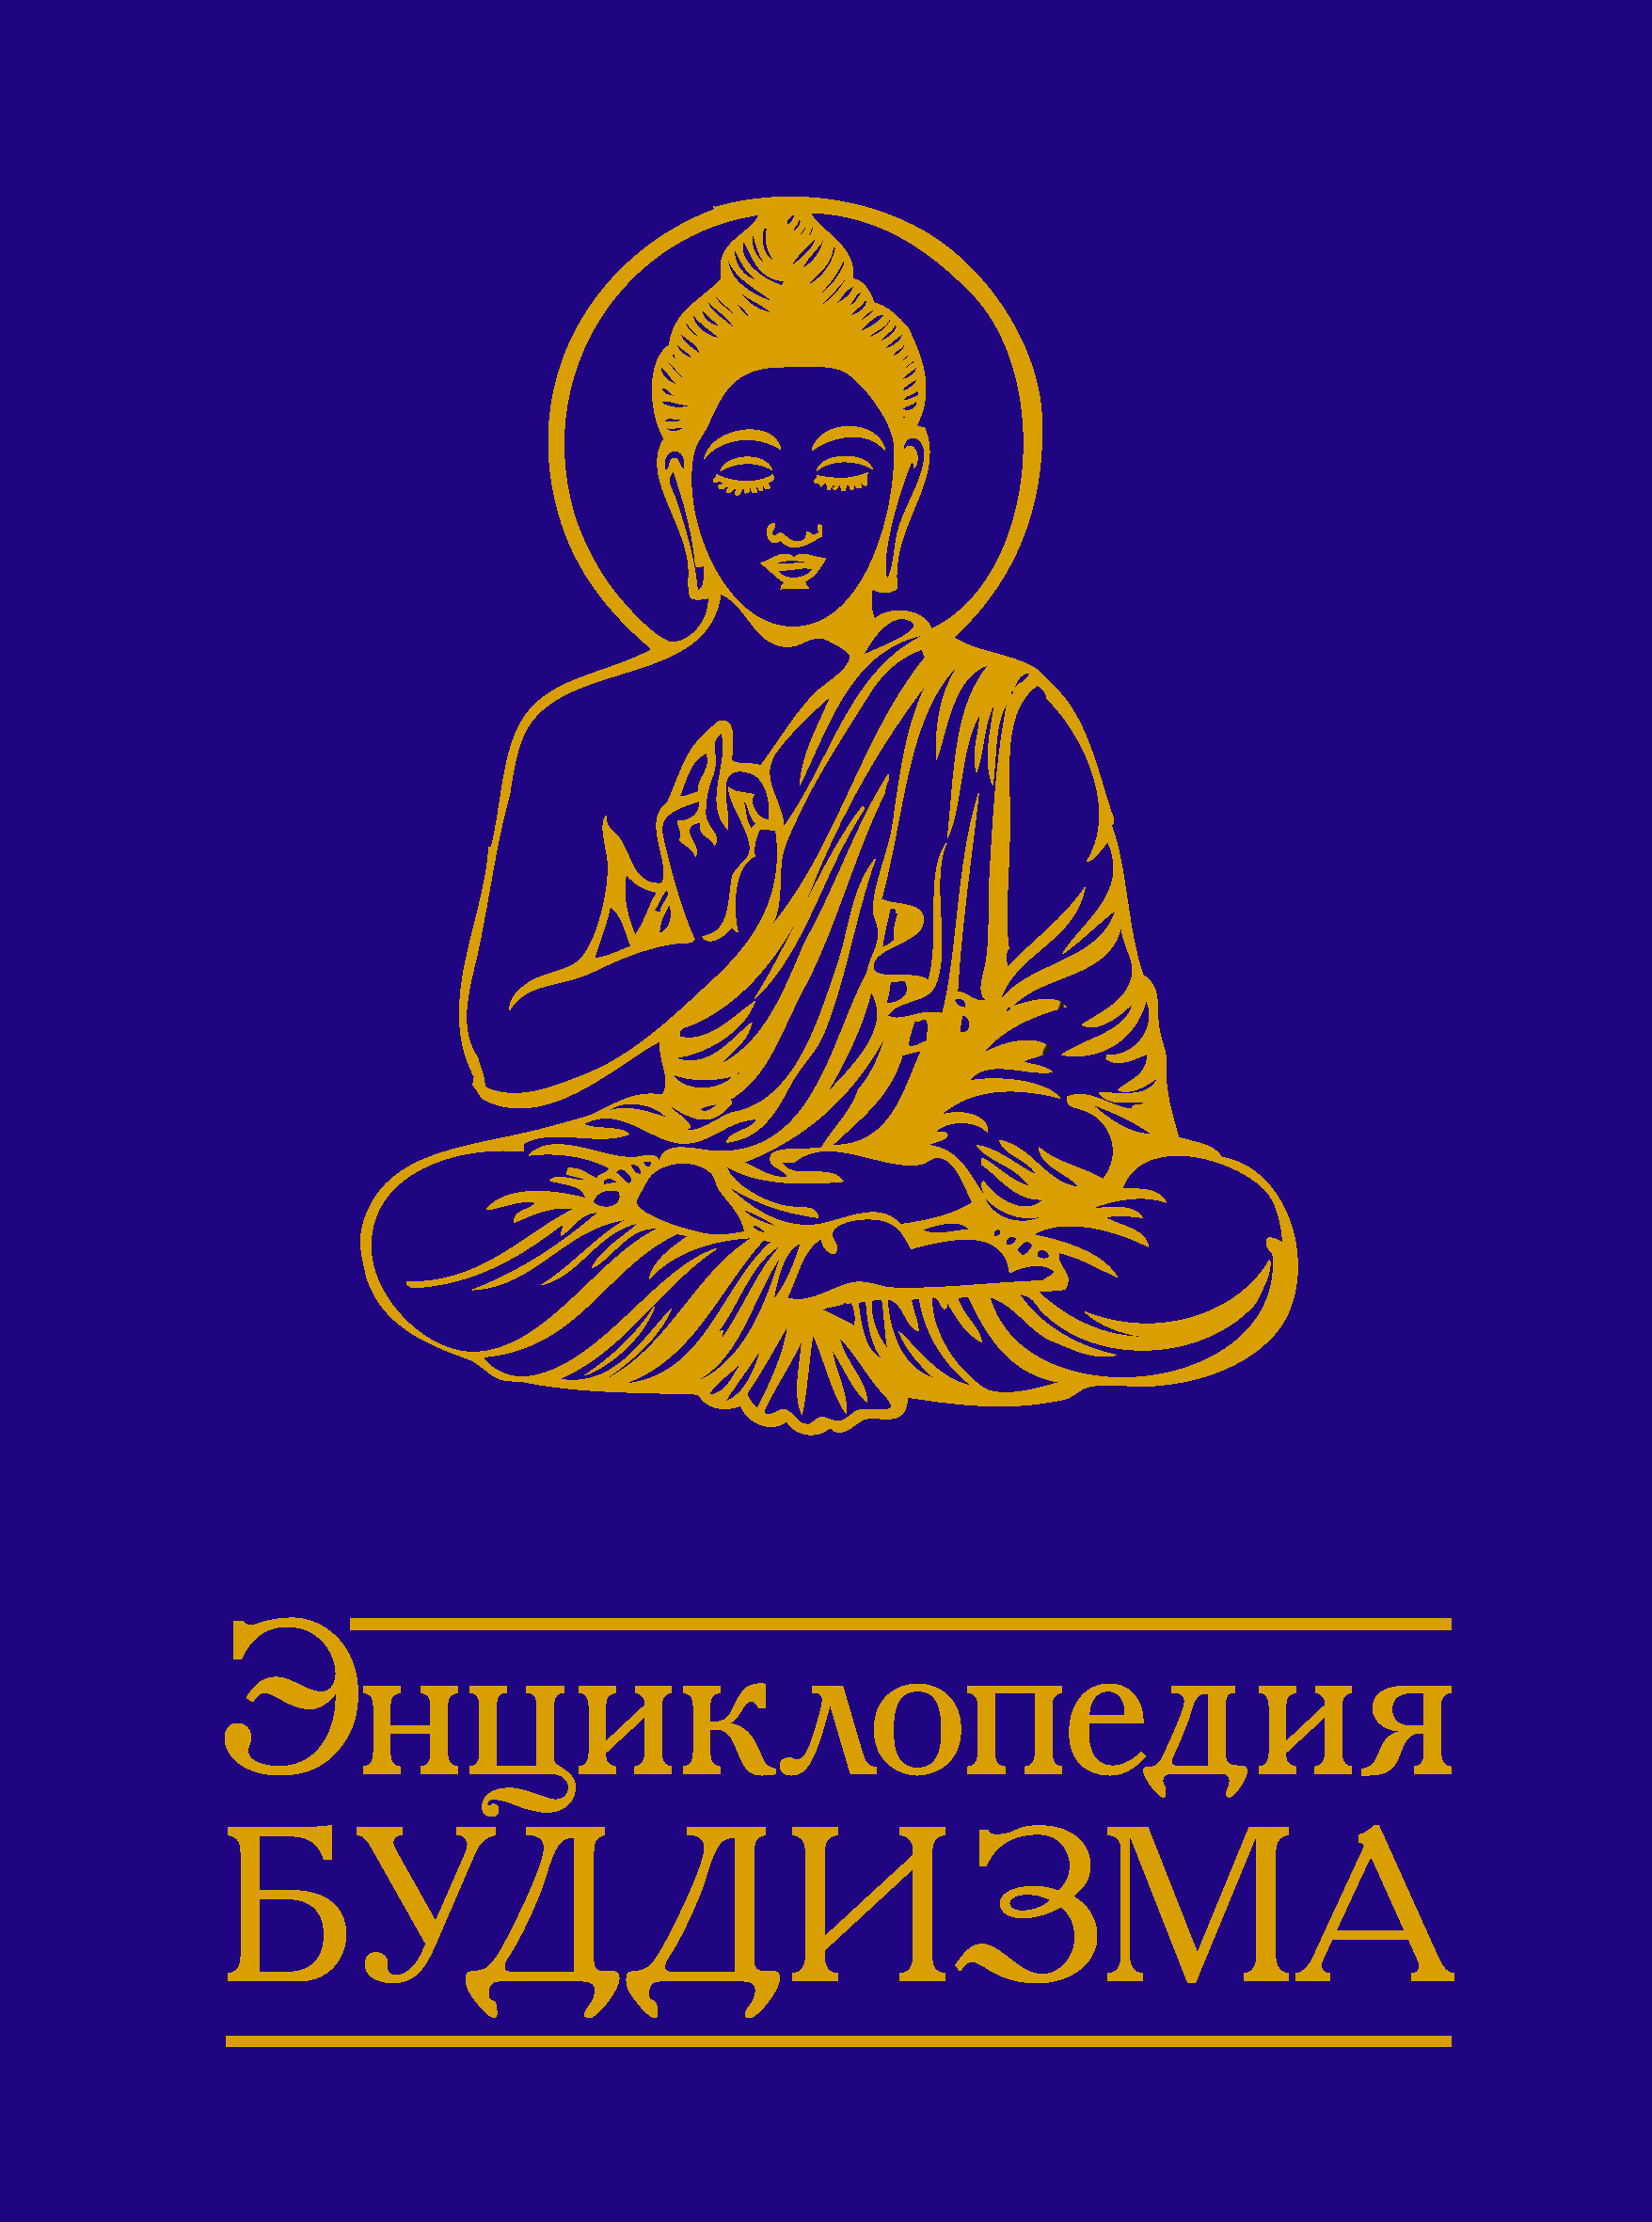 Энциклопедия буддизма. 2-е изд.